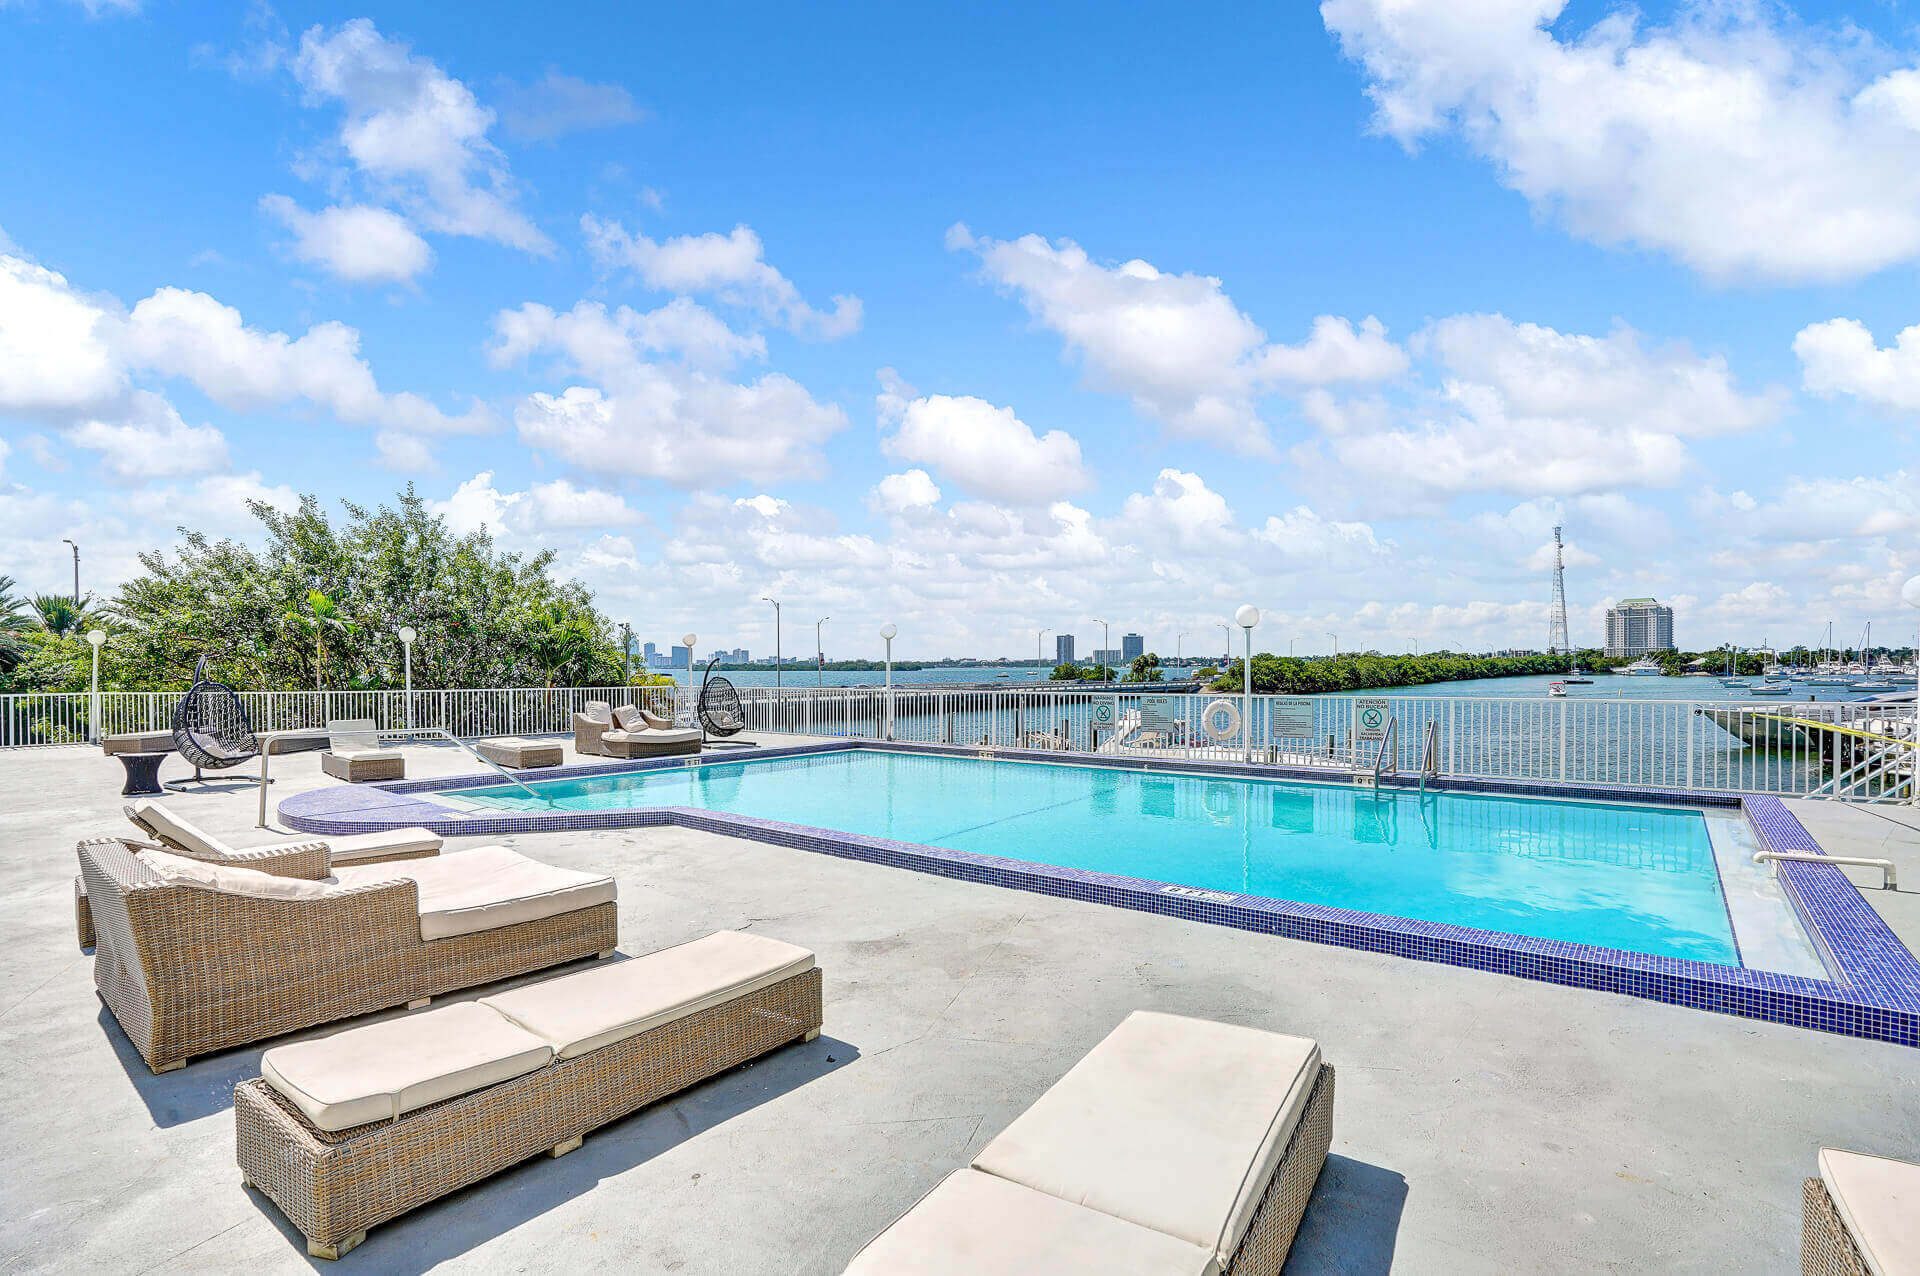 piscine dans une copropriete de miami